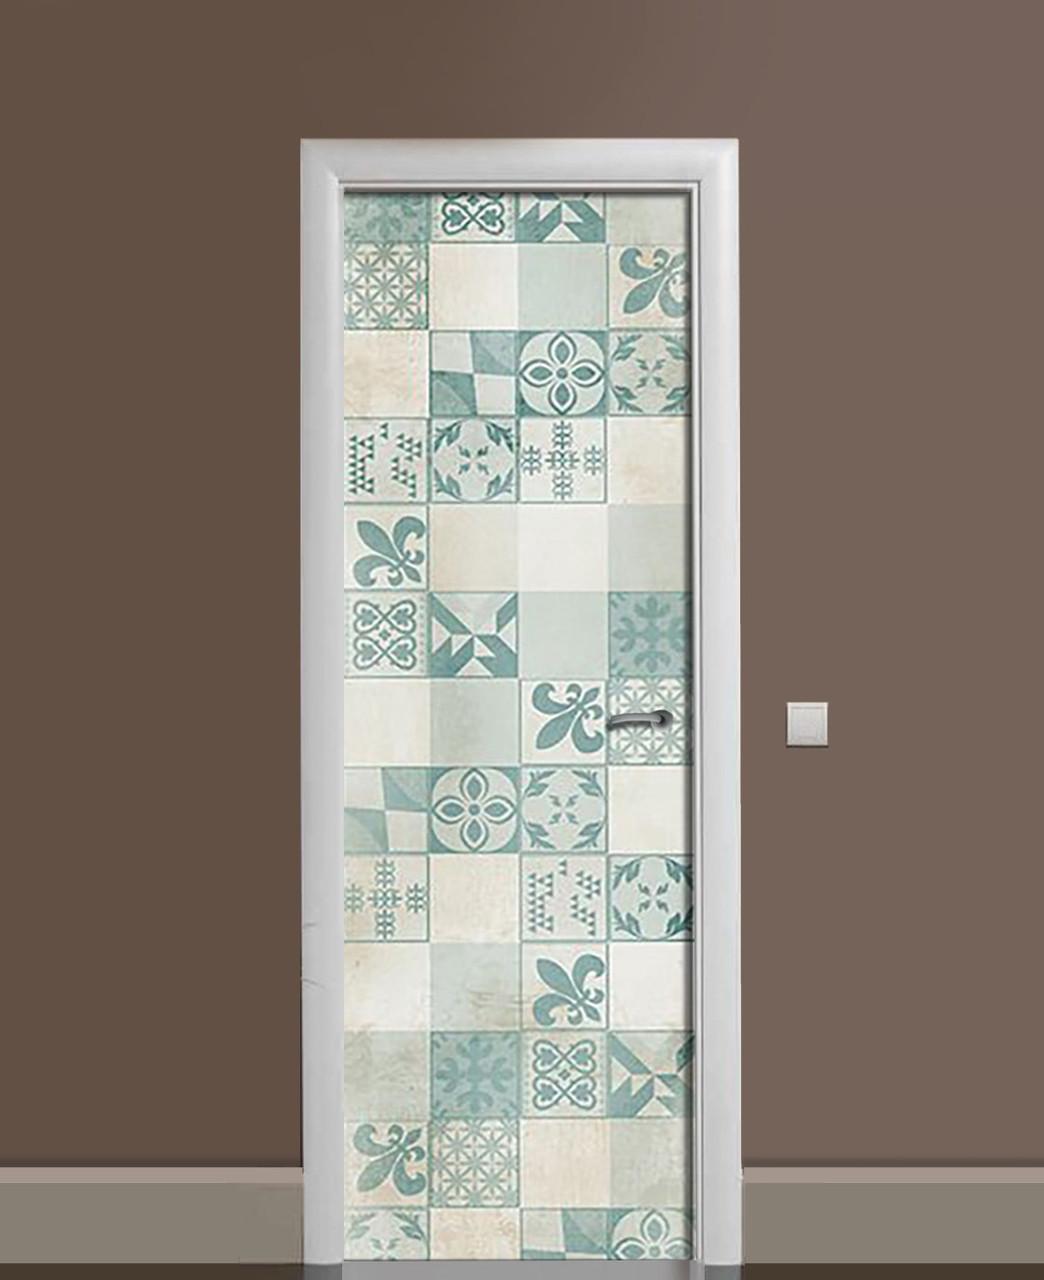 Декоративная наклейка на двери Азулежу Бирюза Пэчворк ПВХ пленка с ламинацией 65*200см Геометрия Голубой